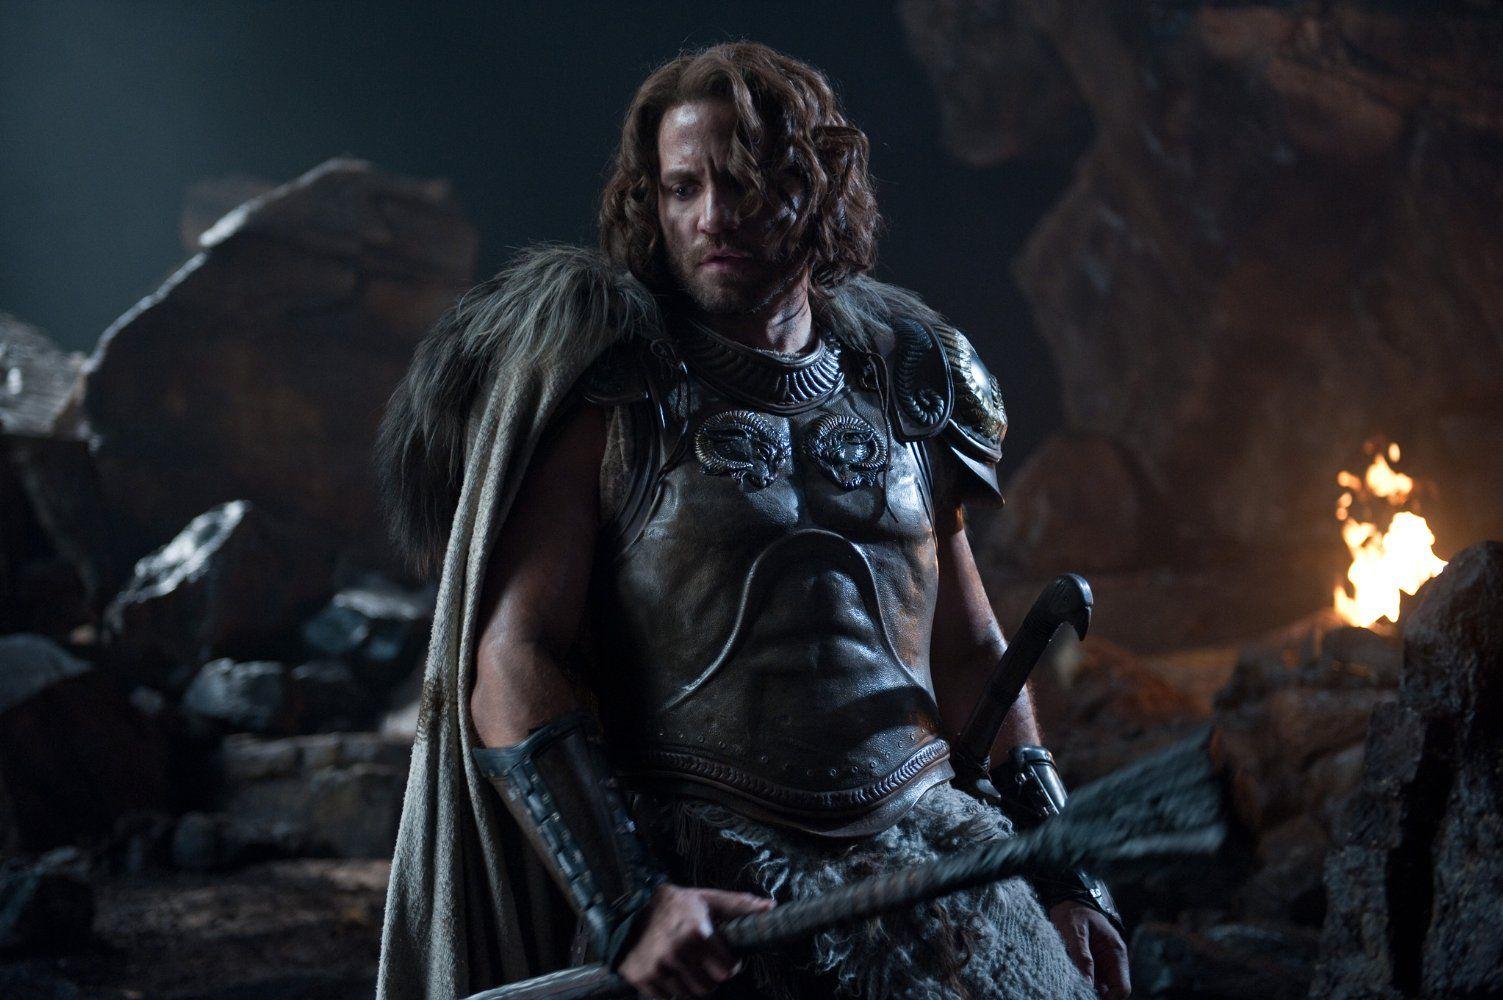 Ira De Titanes 2012 Imdb Wrath Of The Titans Clash Of The Titans God Of War